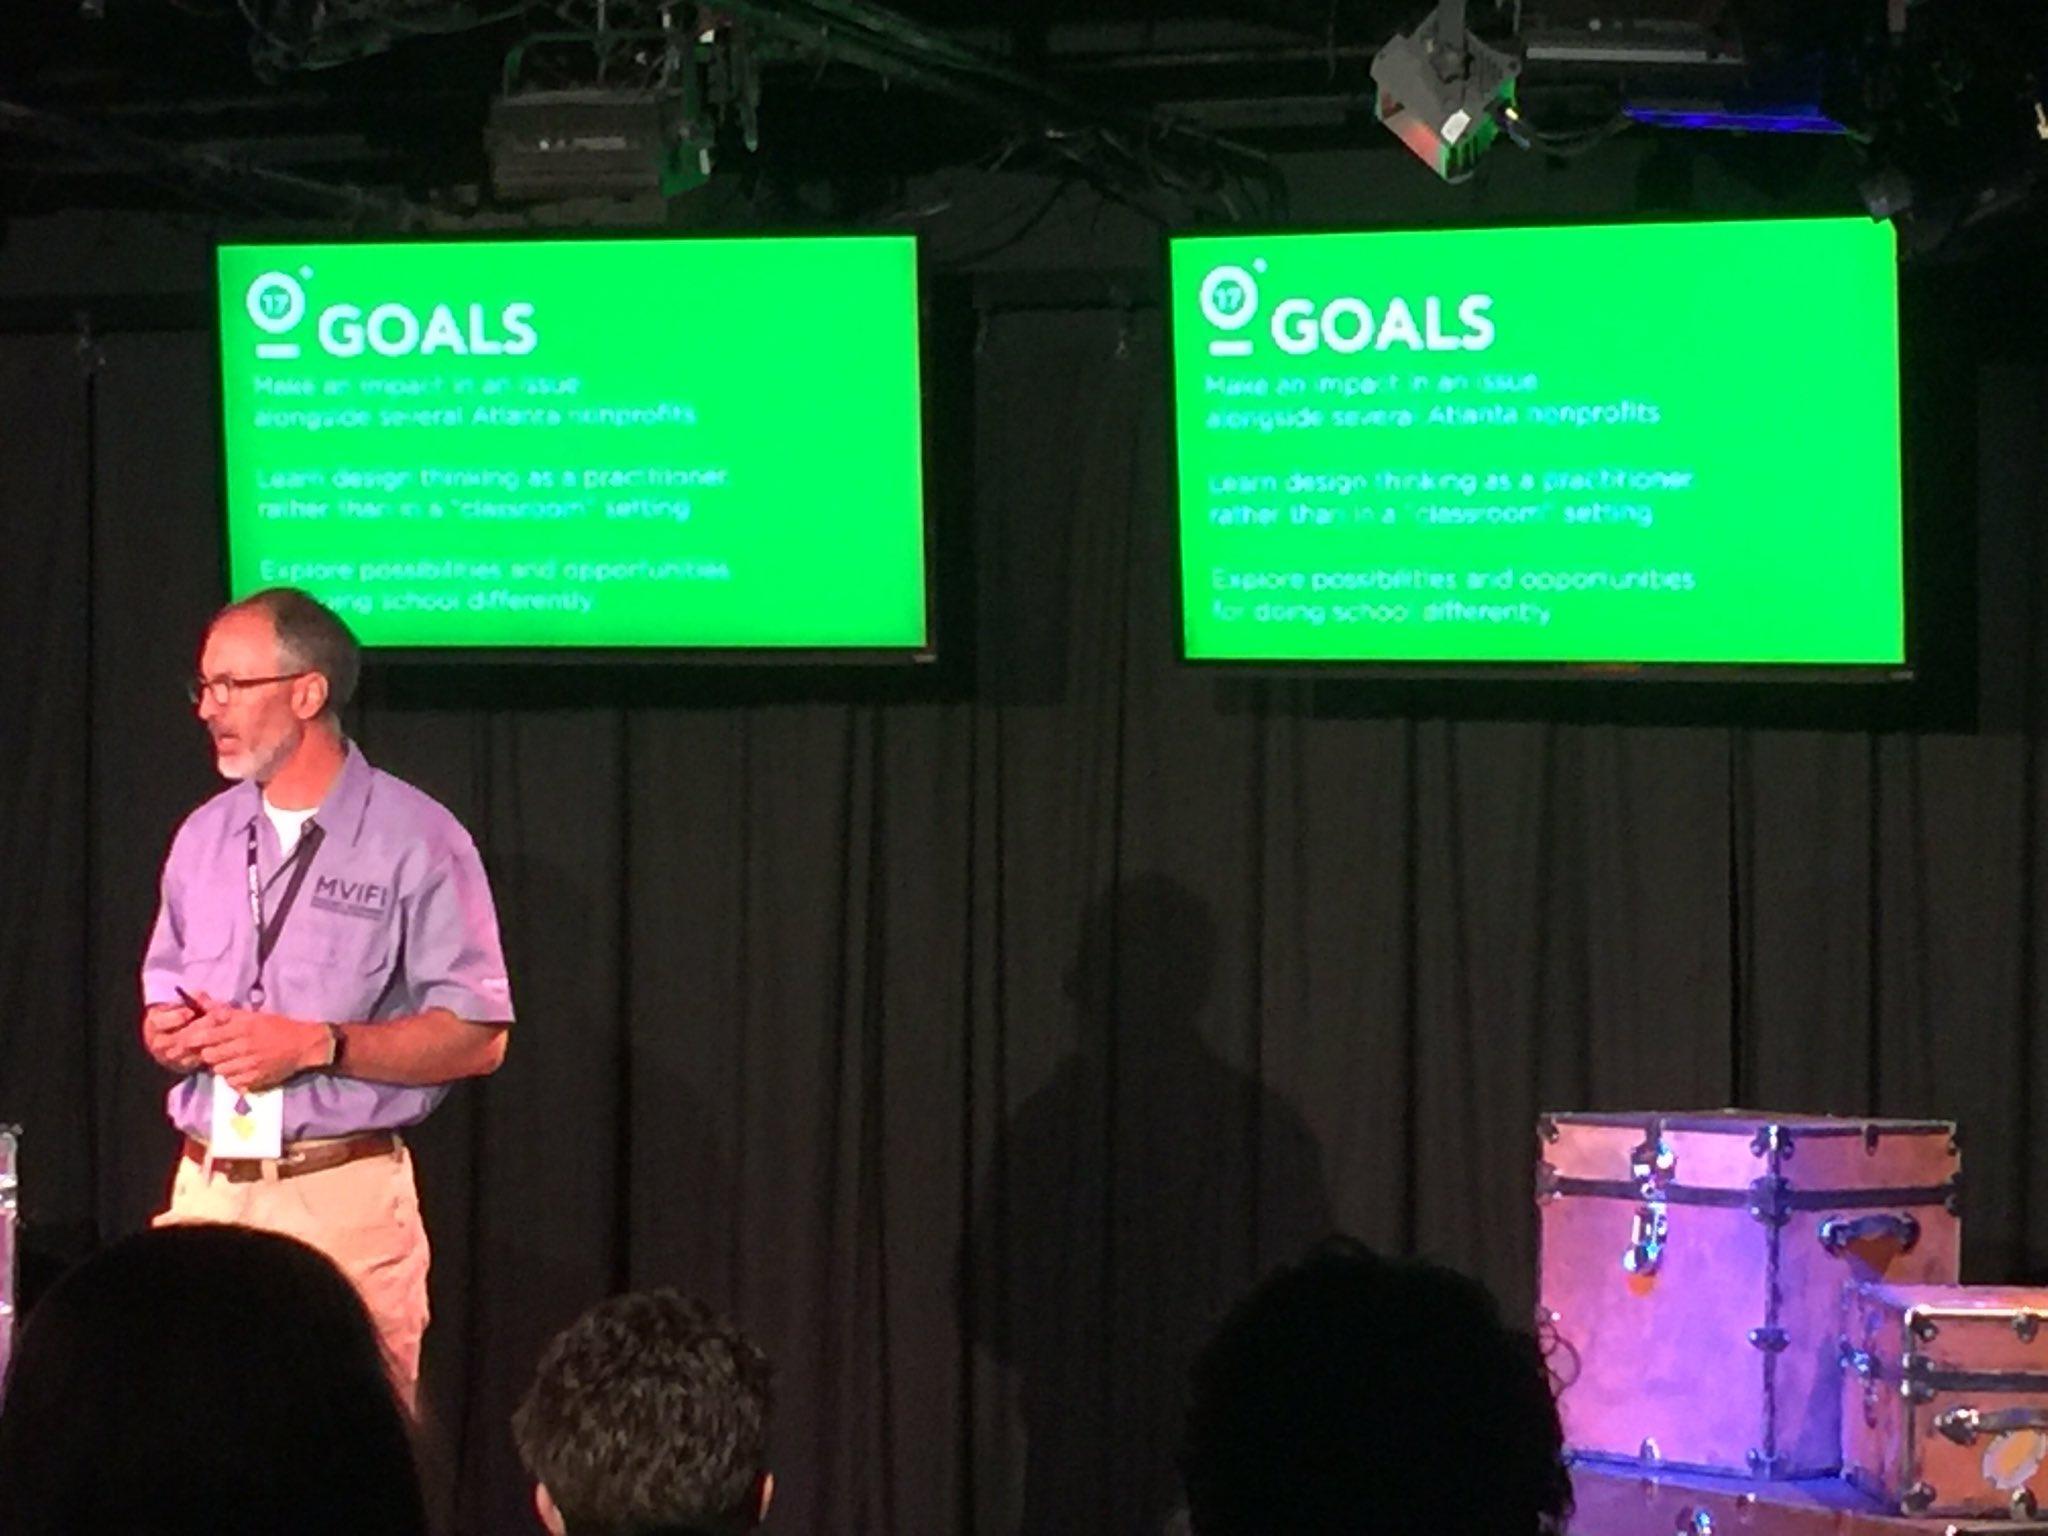 Goals: Help an Atlanta Non-Profit, Learn #designthinking, Window to what school might look like. #FUSE17 https://t.co/0IIMGEQajI